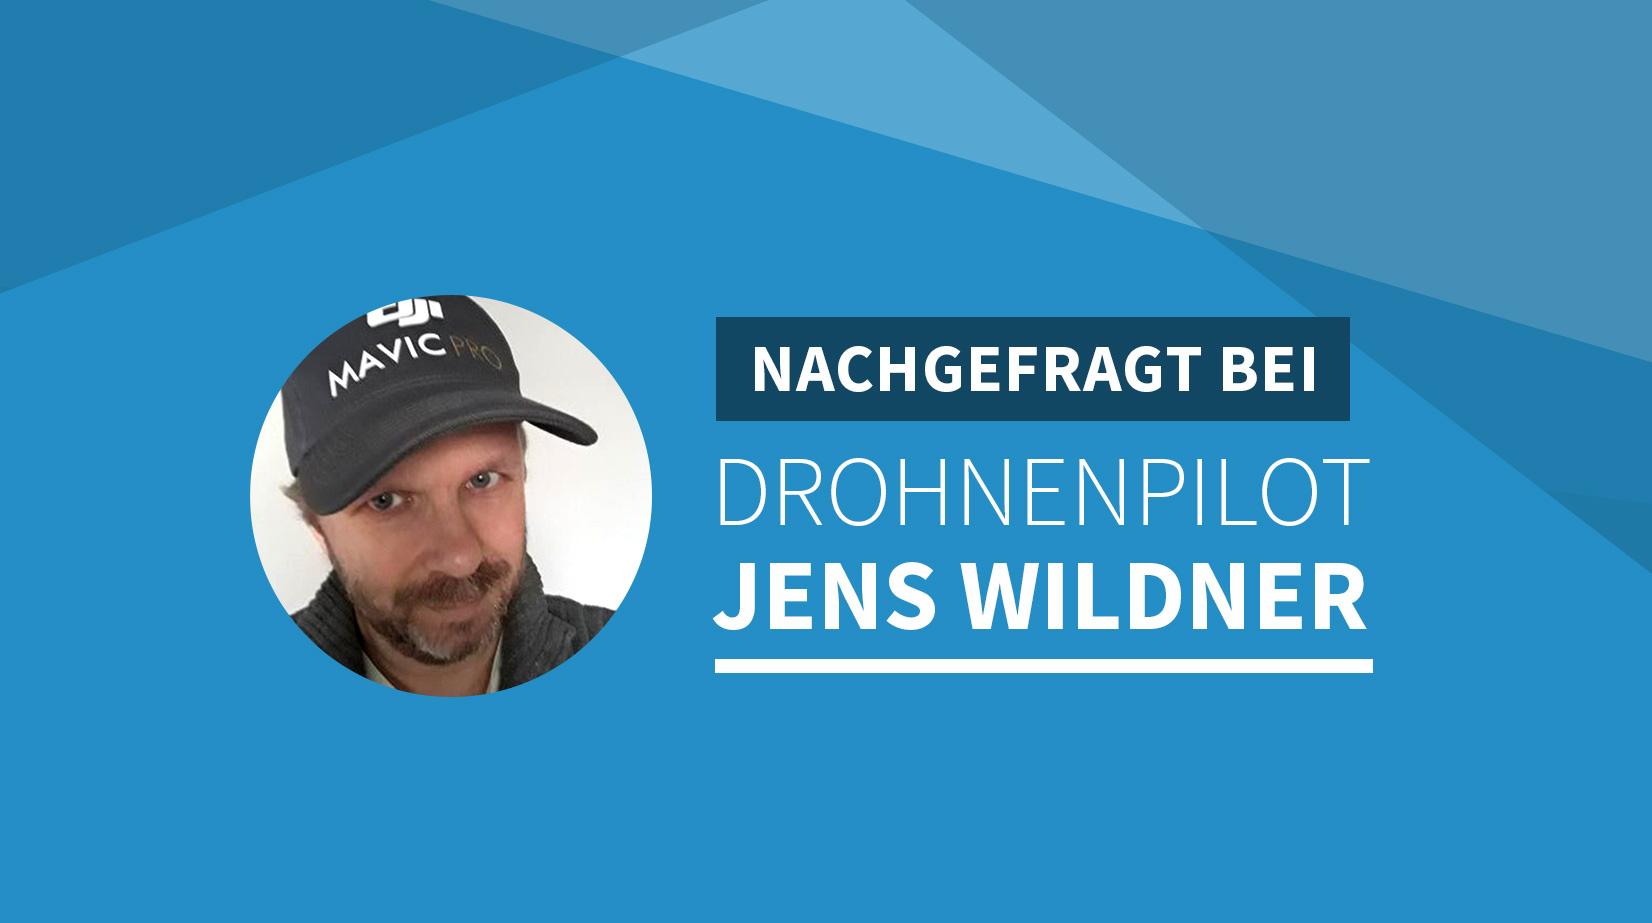 Nachgefragt bei Drohnenpilot Jens Wildner